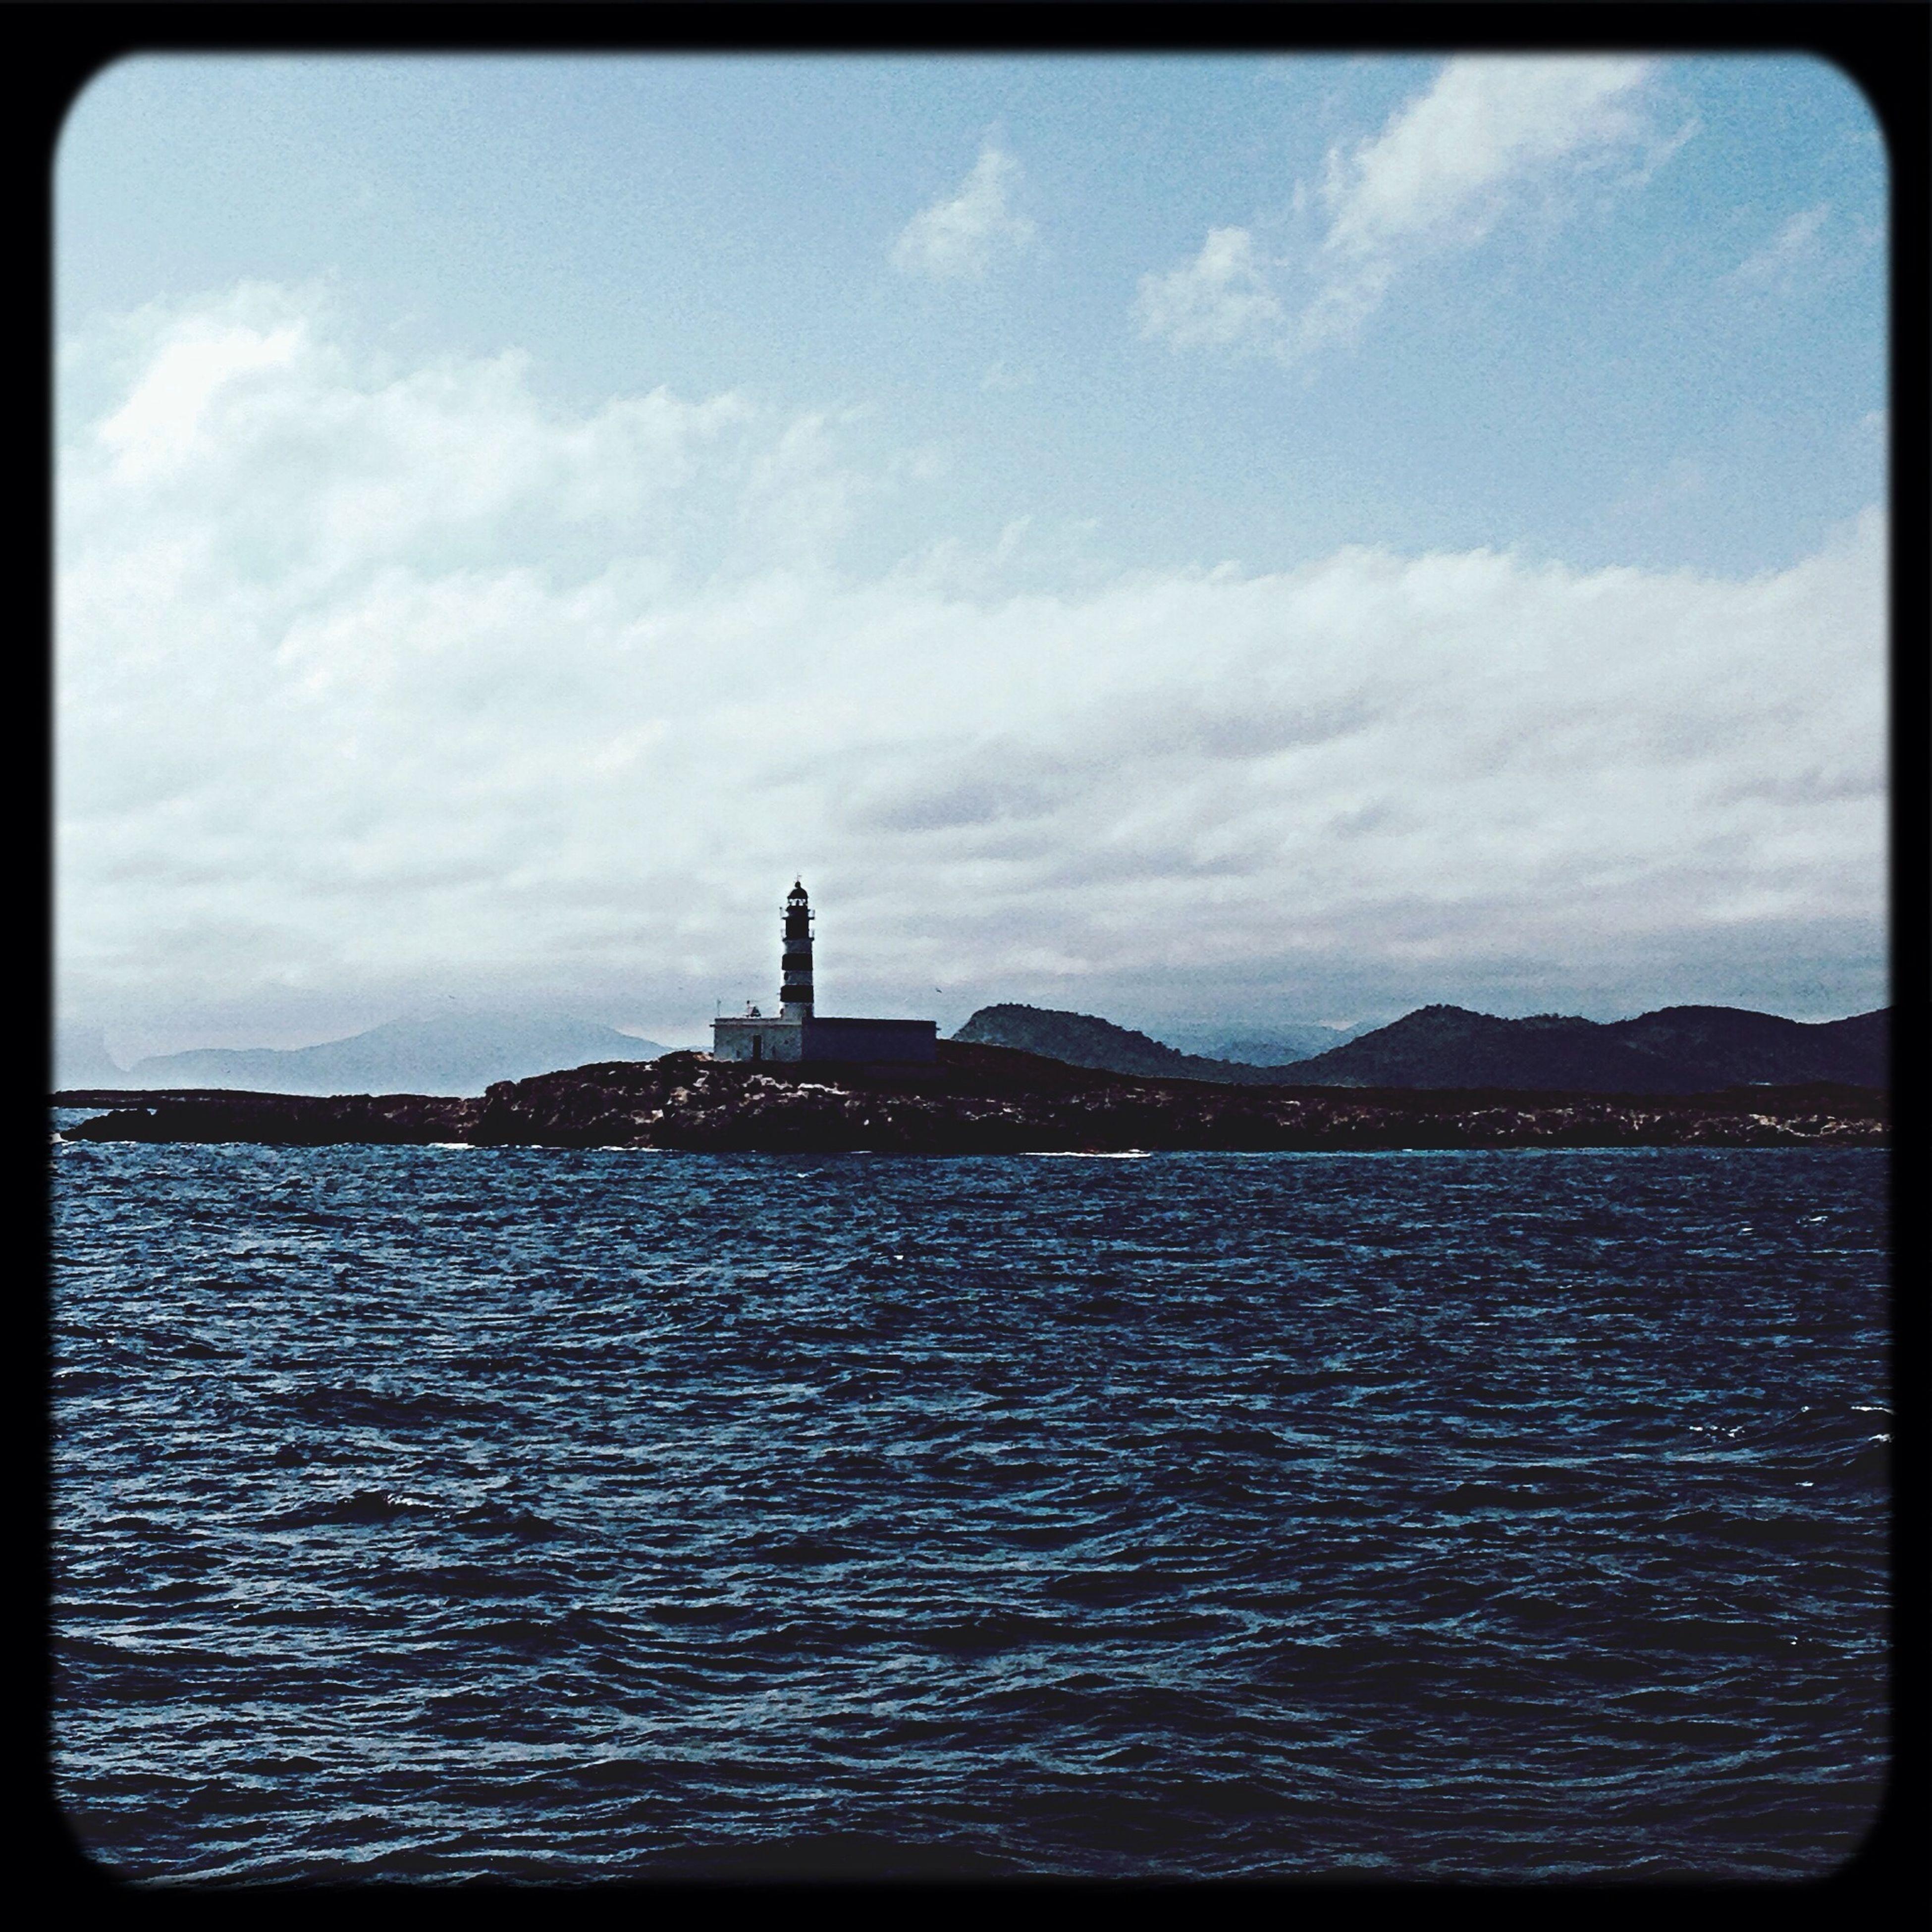 Lighthouse Relaxing Cruise Ship Enyoing Life